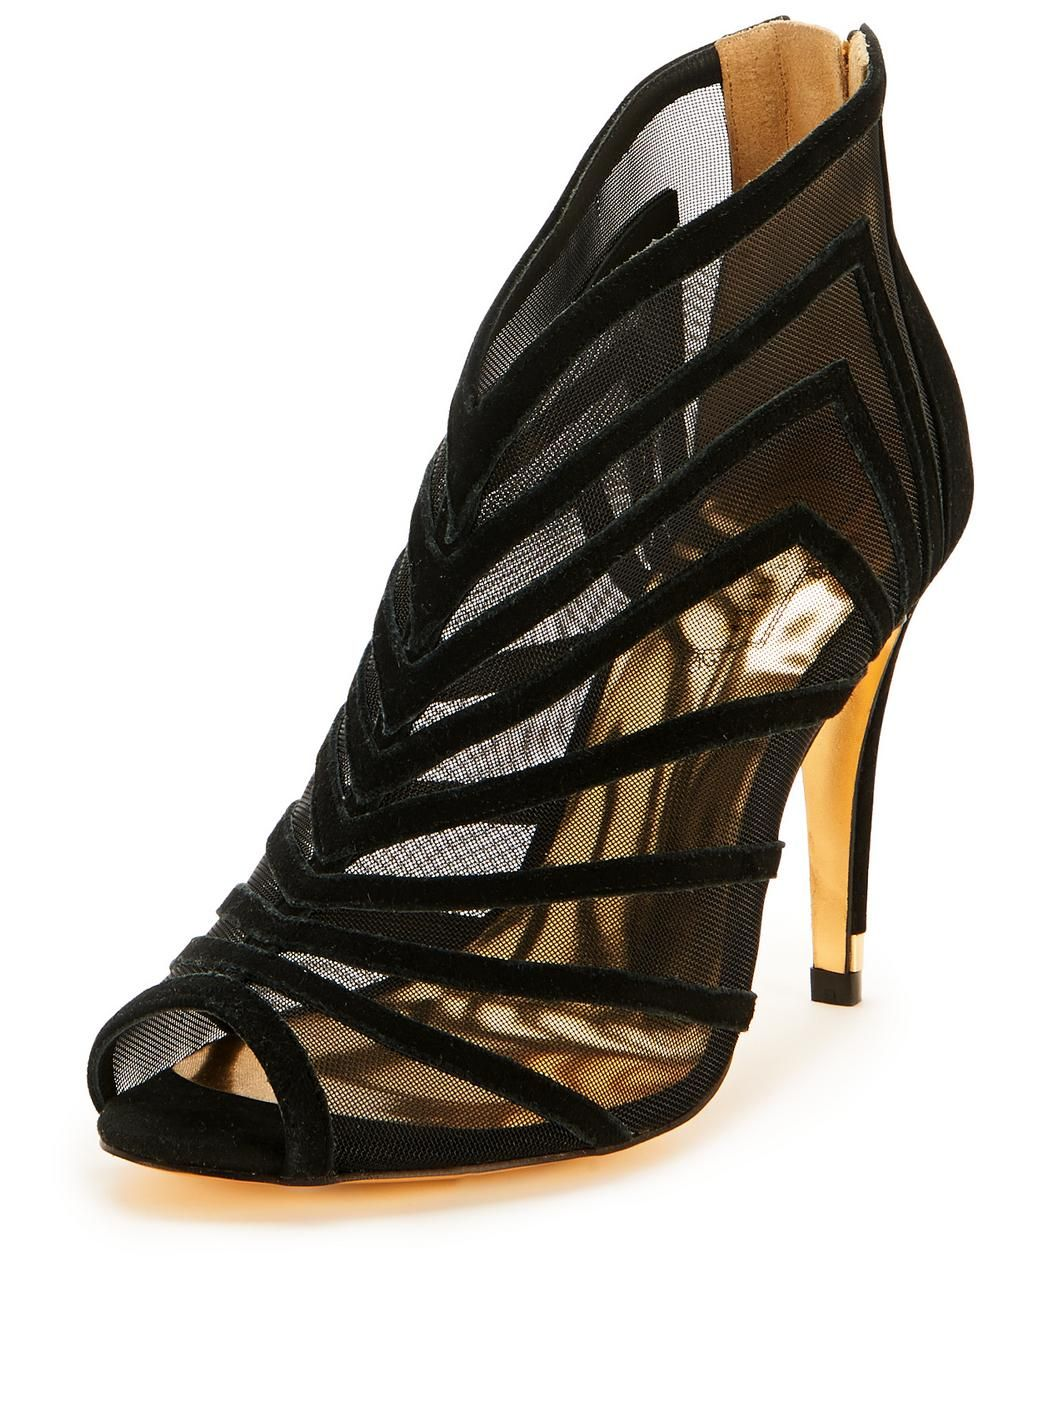 Black sandals littlewoods - Chiantea Cut Out Mesh Shoe Boots Http Www Littlewoods Com